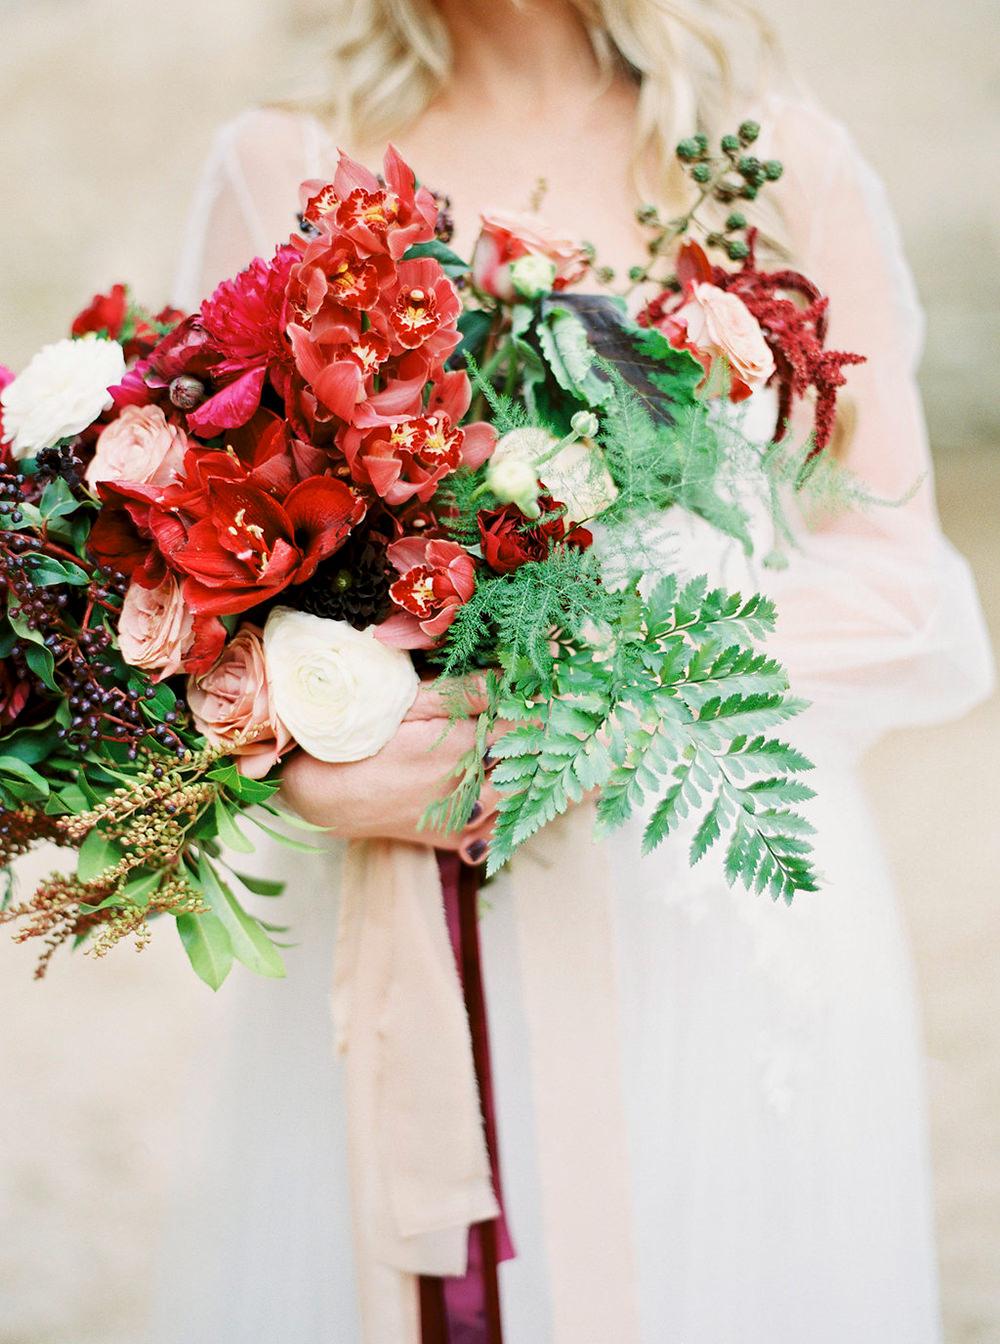 organic wedding bouquets - photo by Amanda Lenhardt https://ruffledblog.com/relaxed-san-juan-capistrano-wedding-inspiration